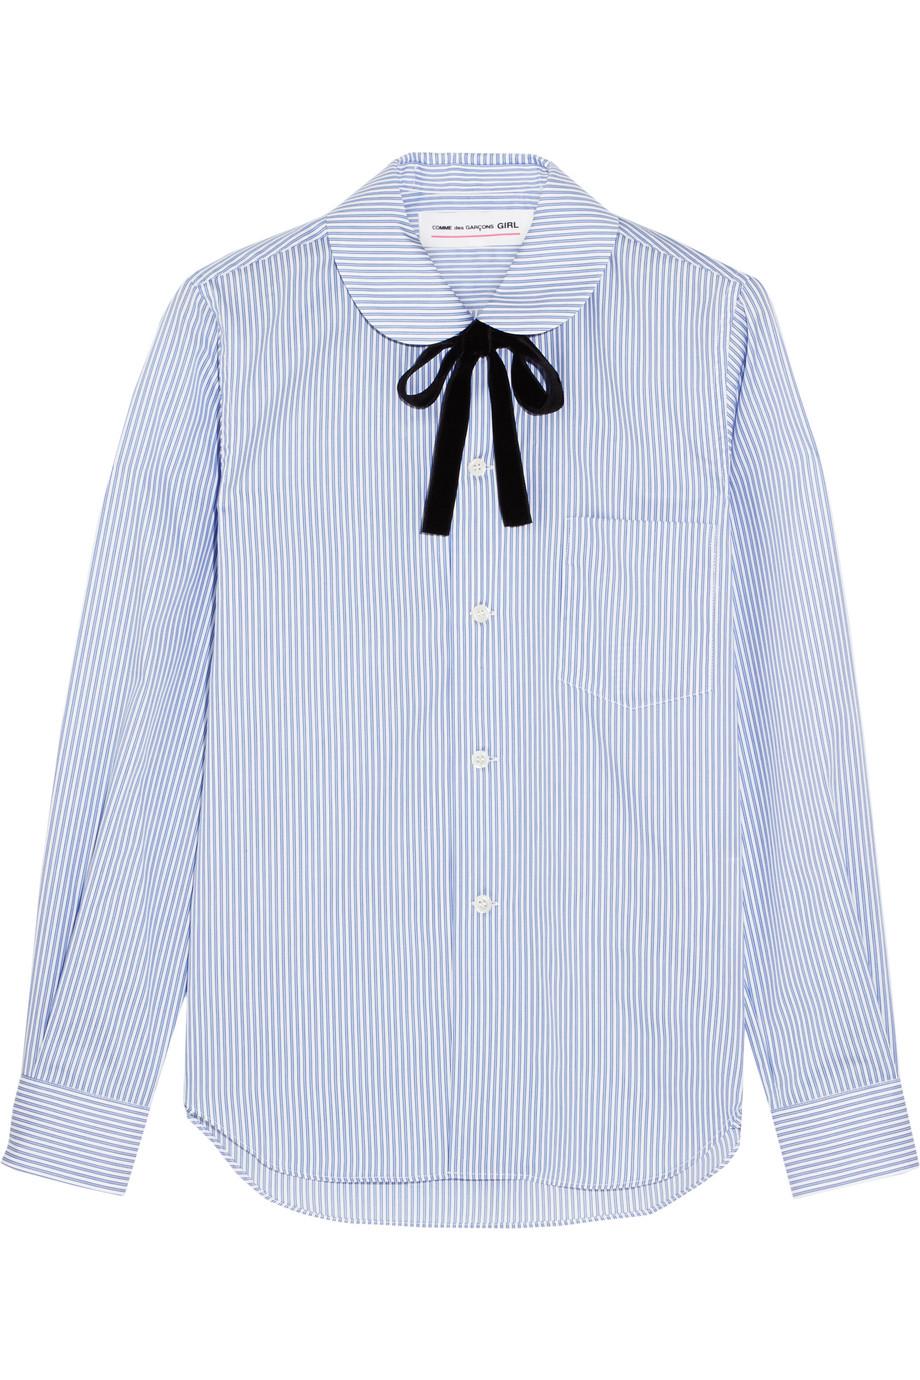 Pussy-Bow Striped Cotton-Poplin Shirt, Blue, Women's